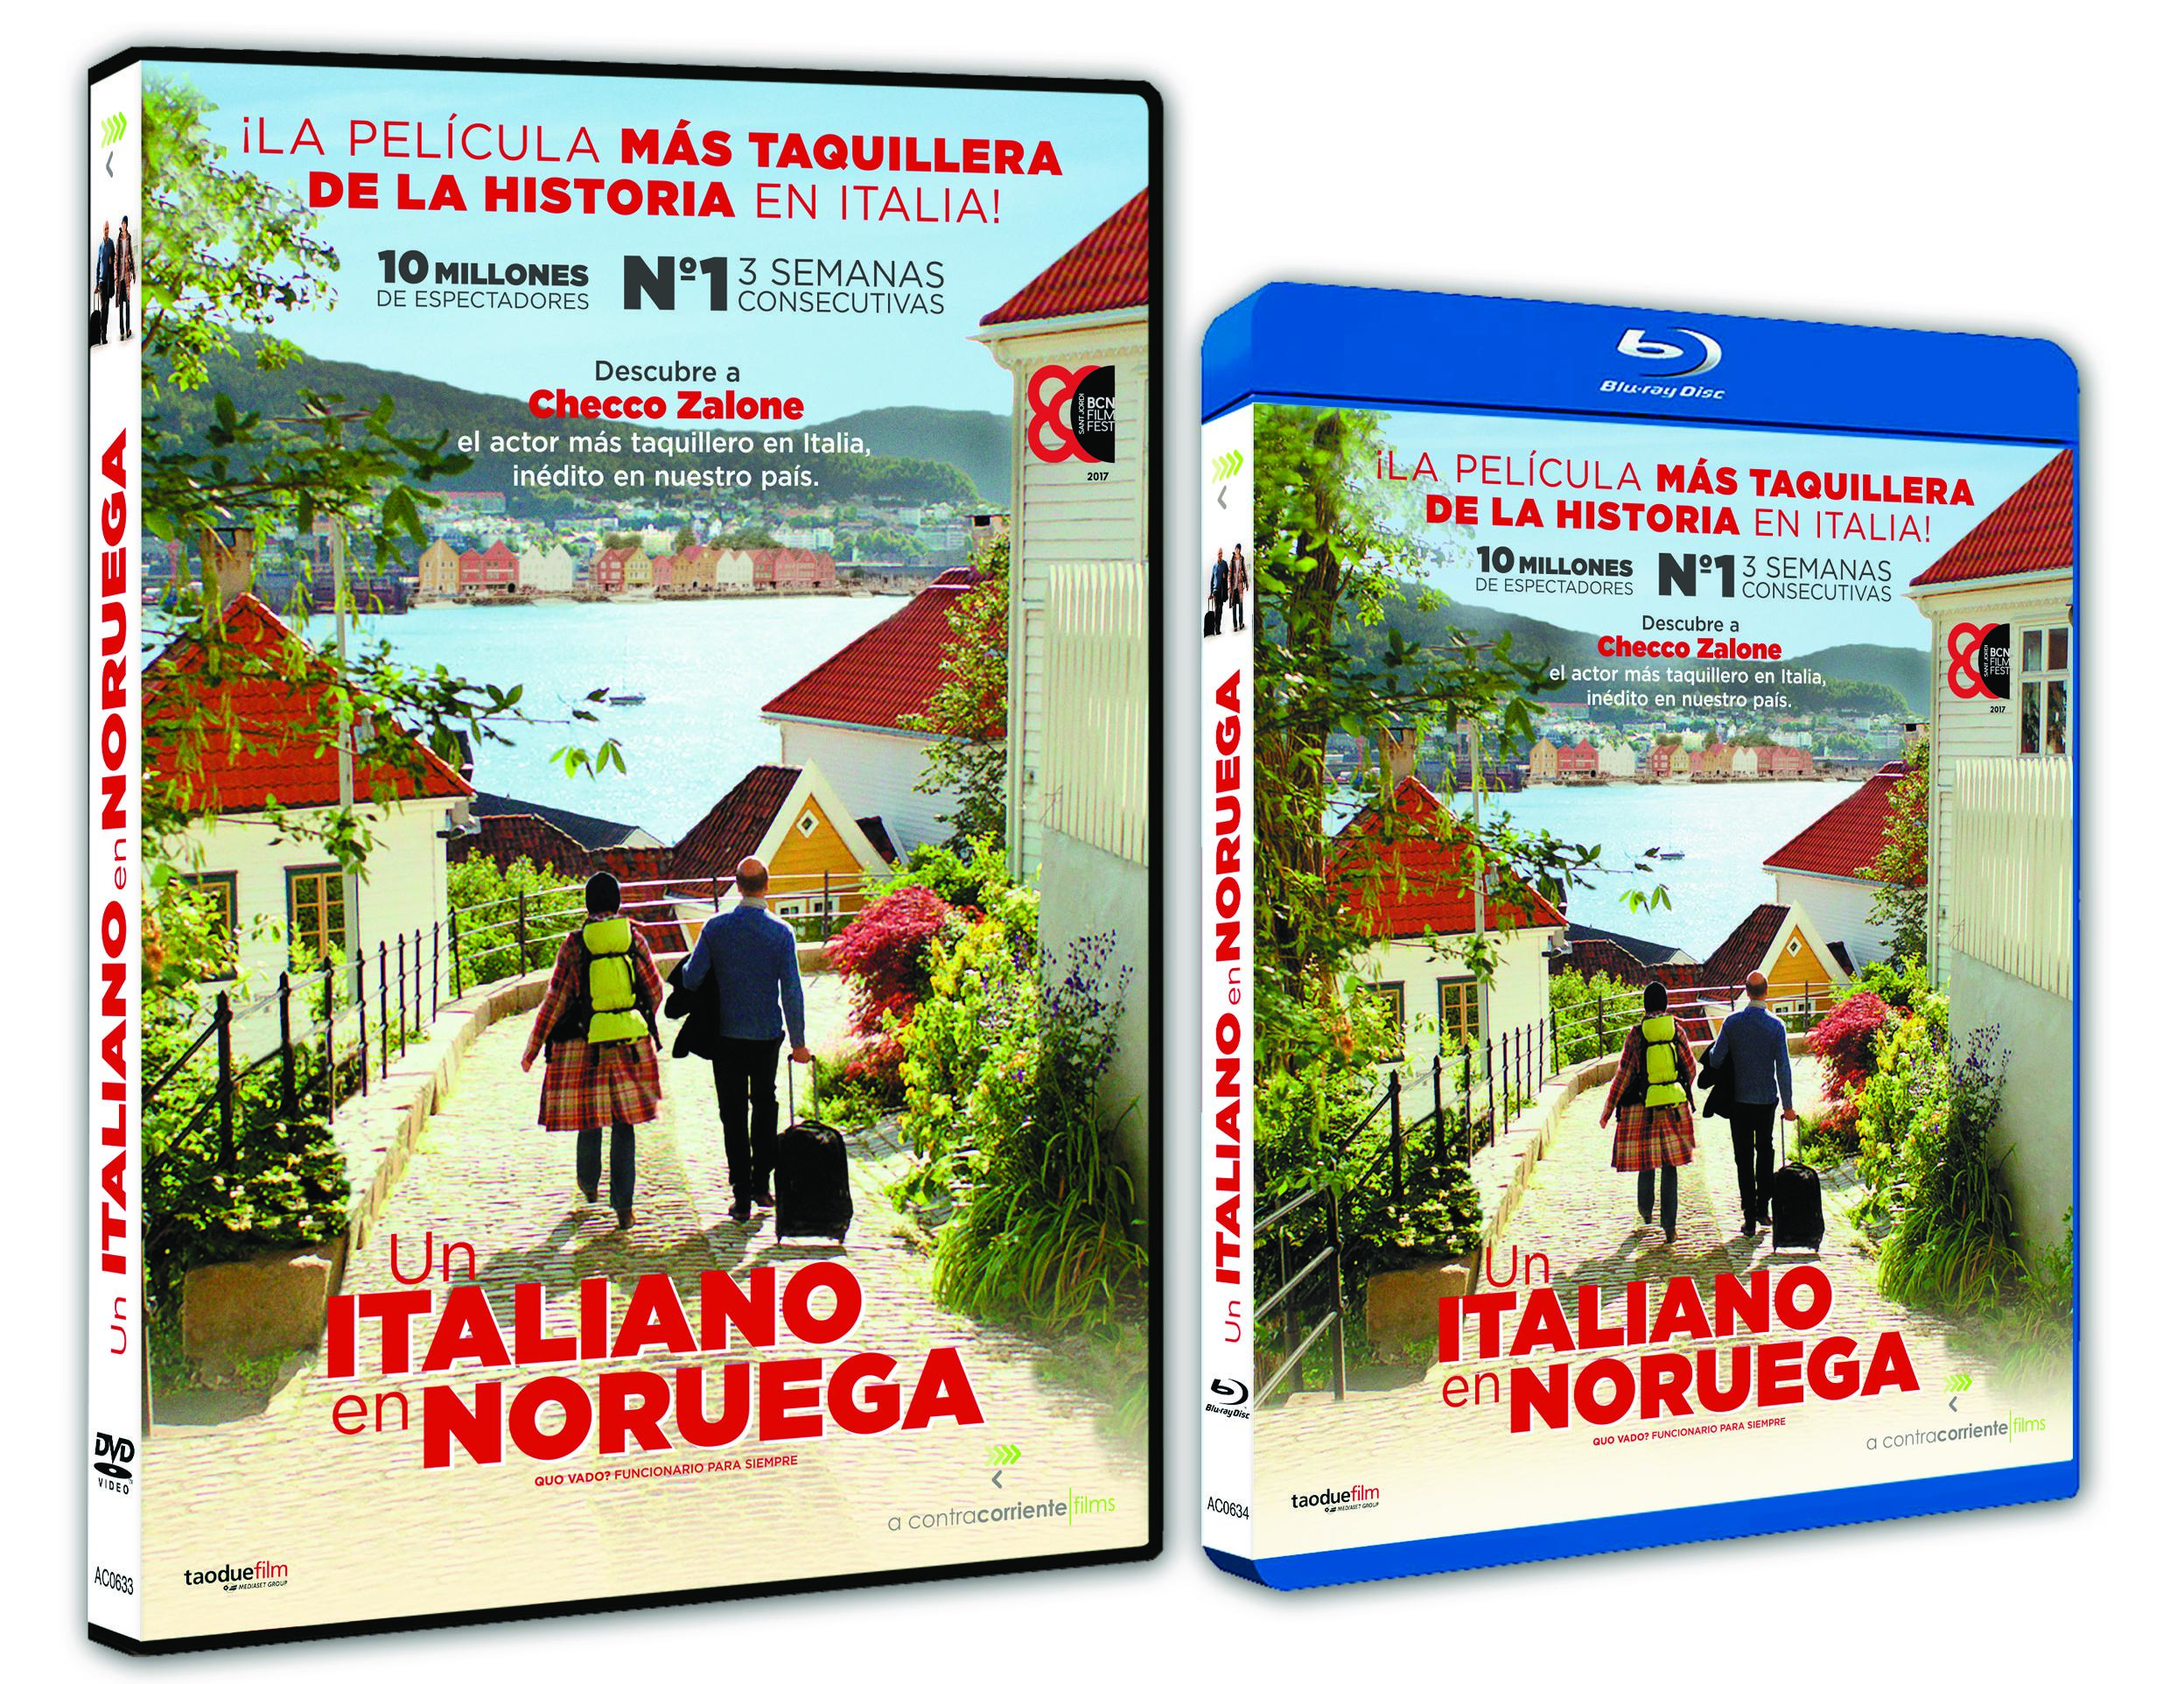 UnItalianoEnNoruega_DVD+BD.jpg_cmyk.jpg